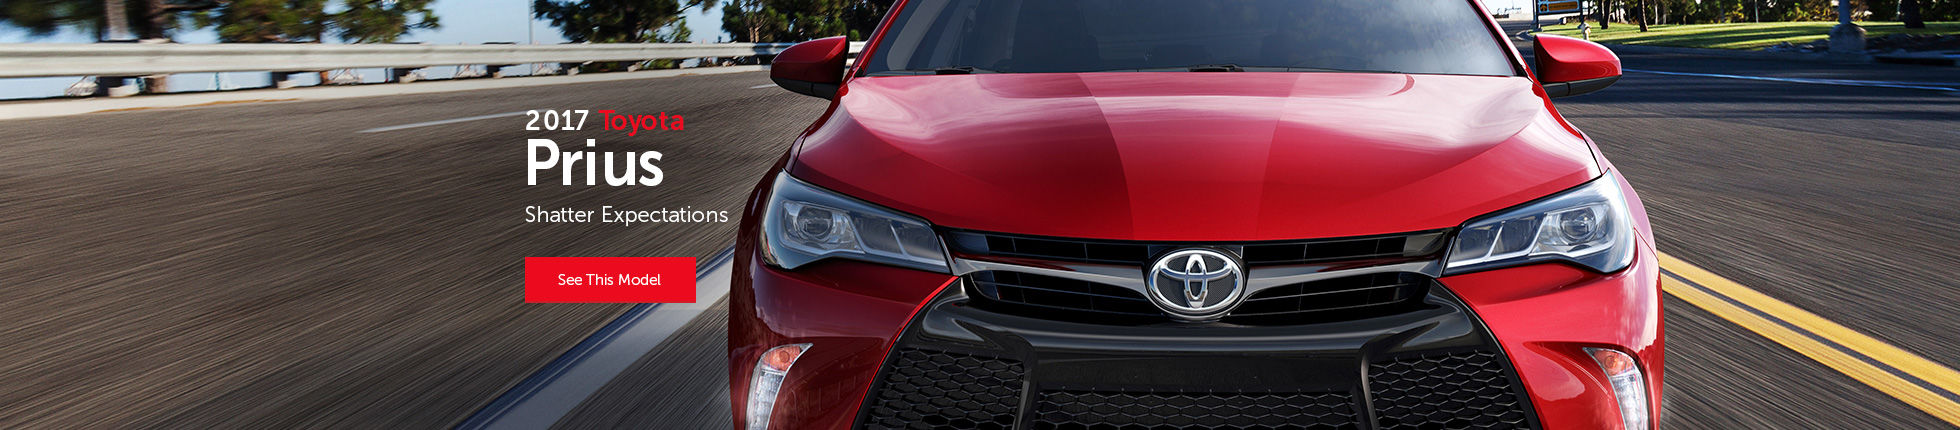 header Prius 2017